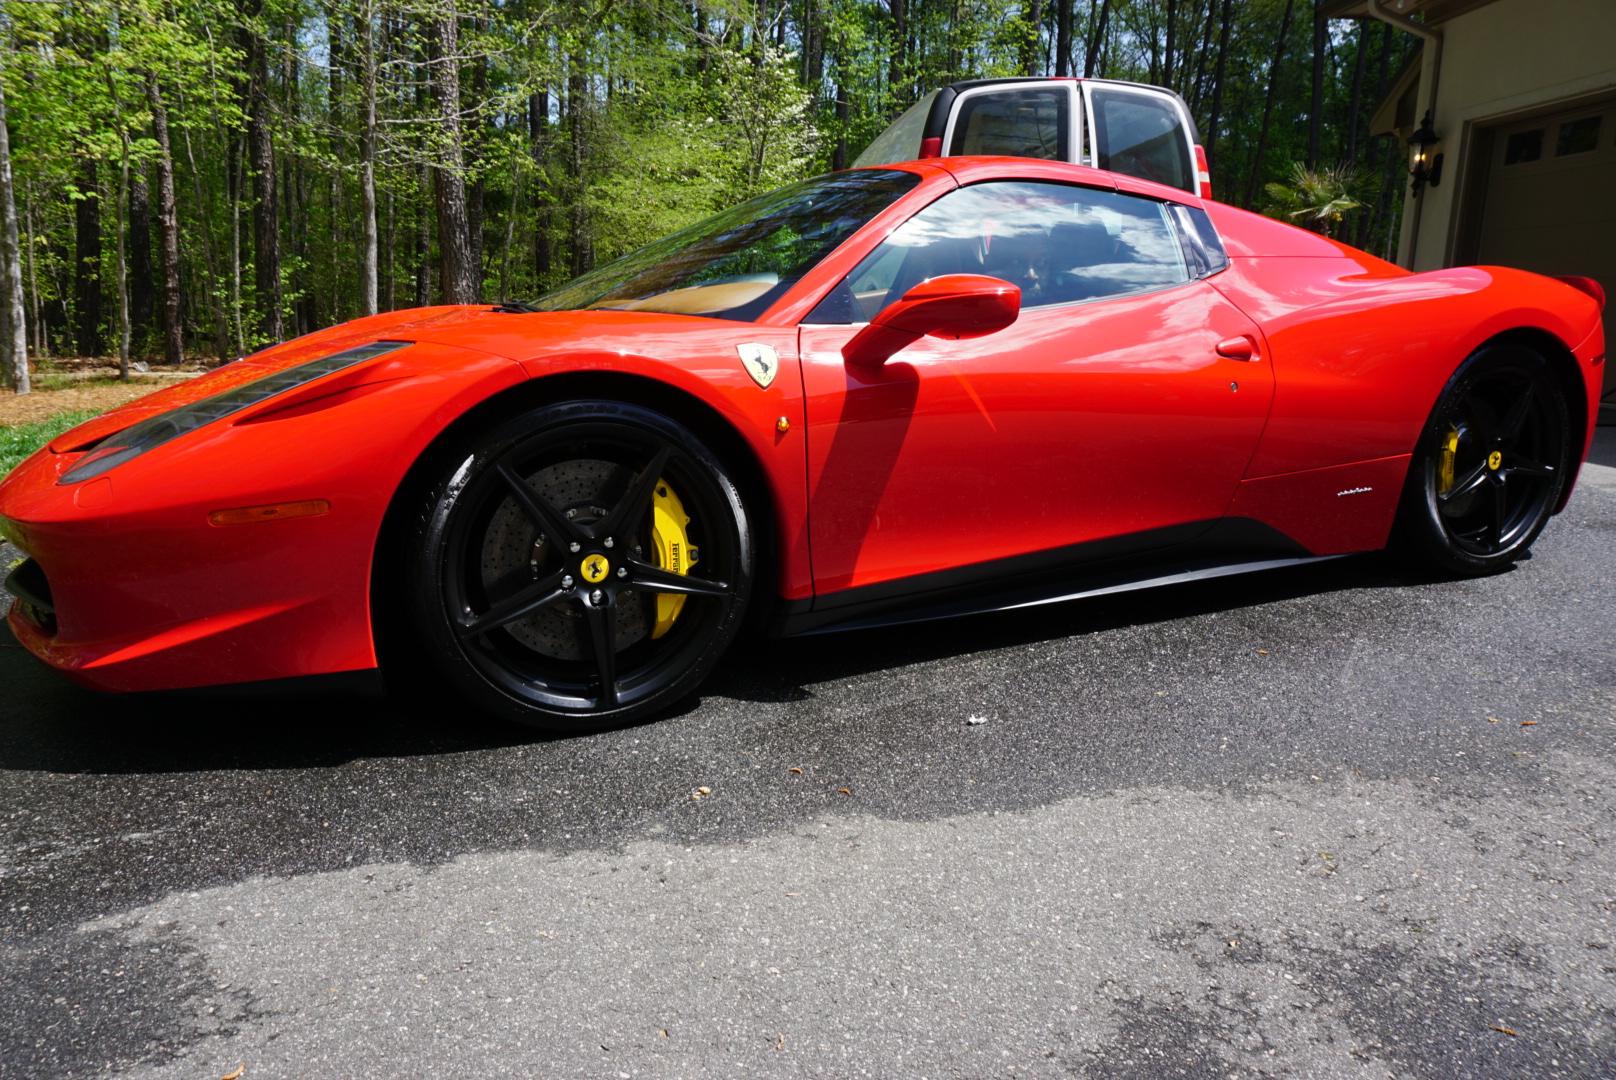 The Beautiful Wash of 2015 Ferrari 458 Italia